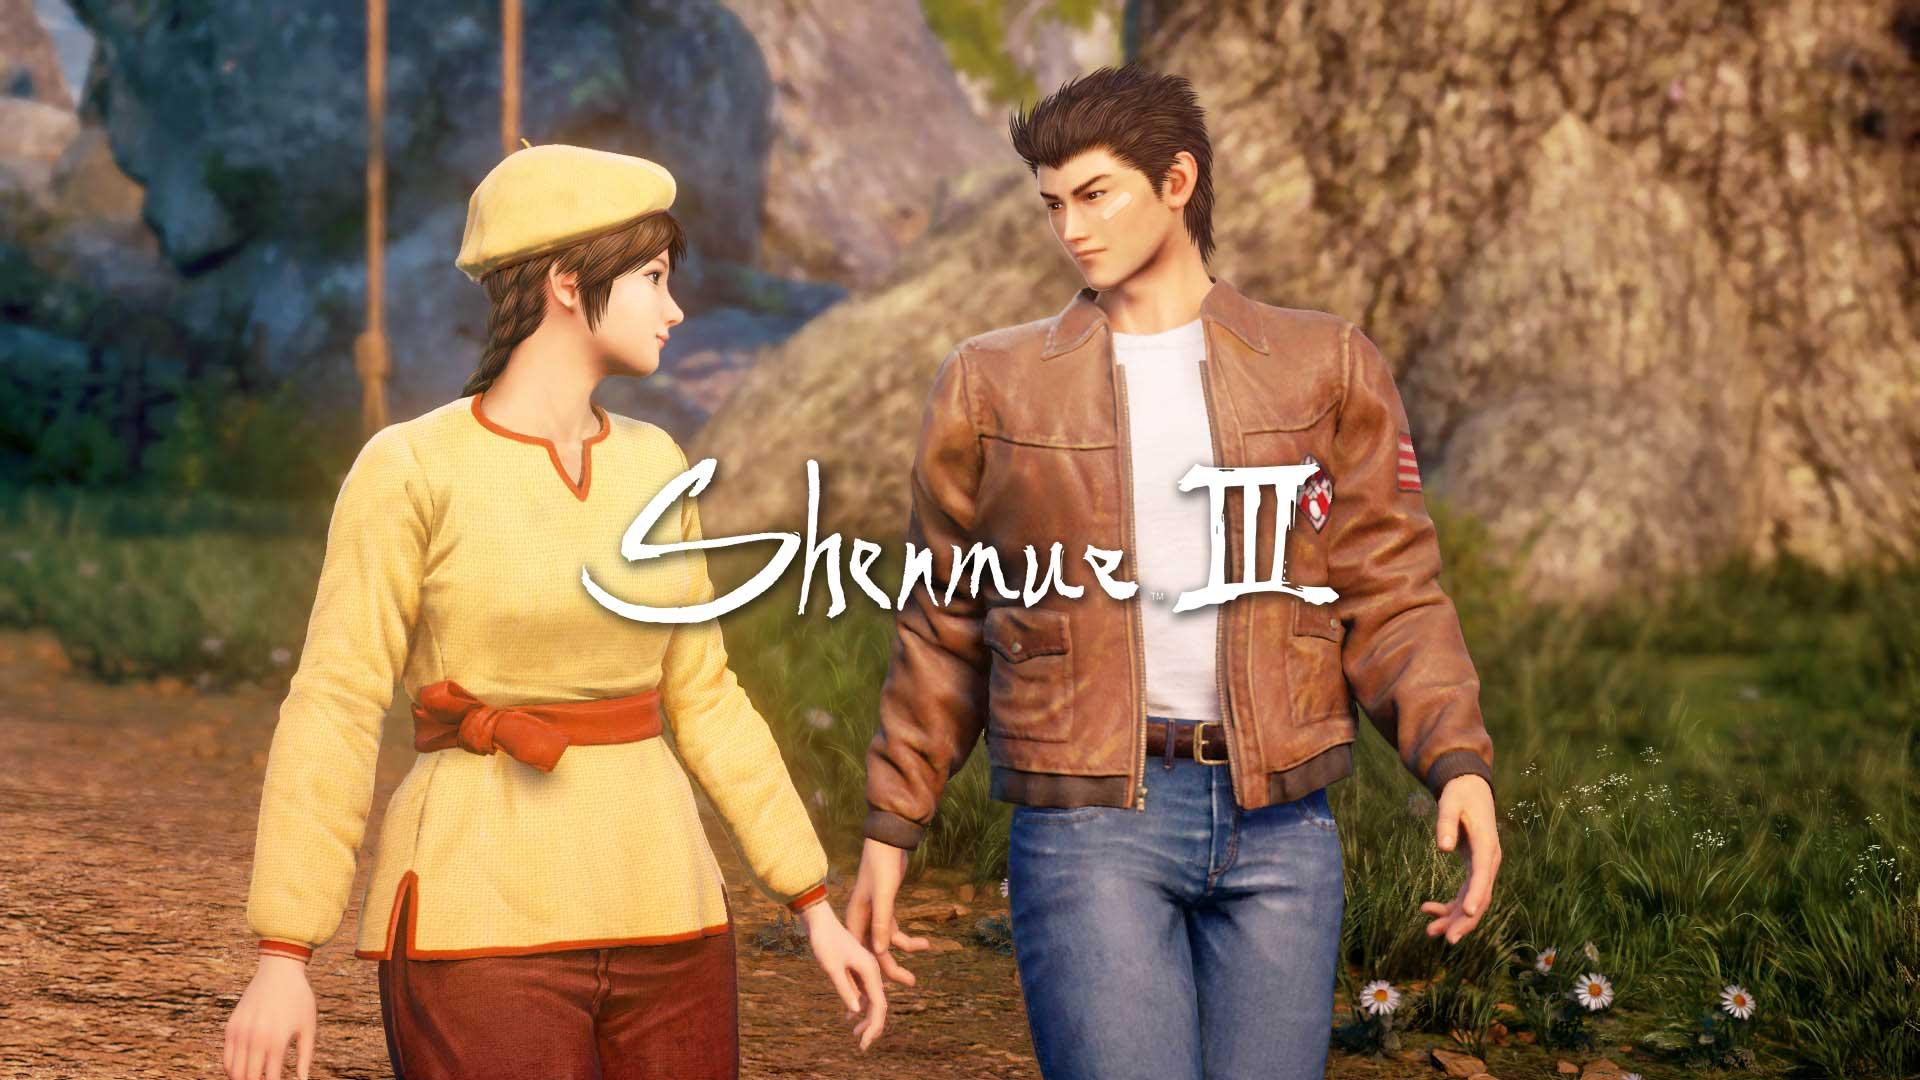 shenmue 3 release sale